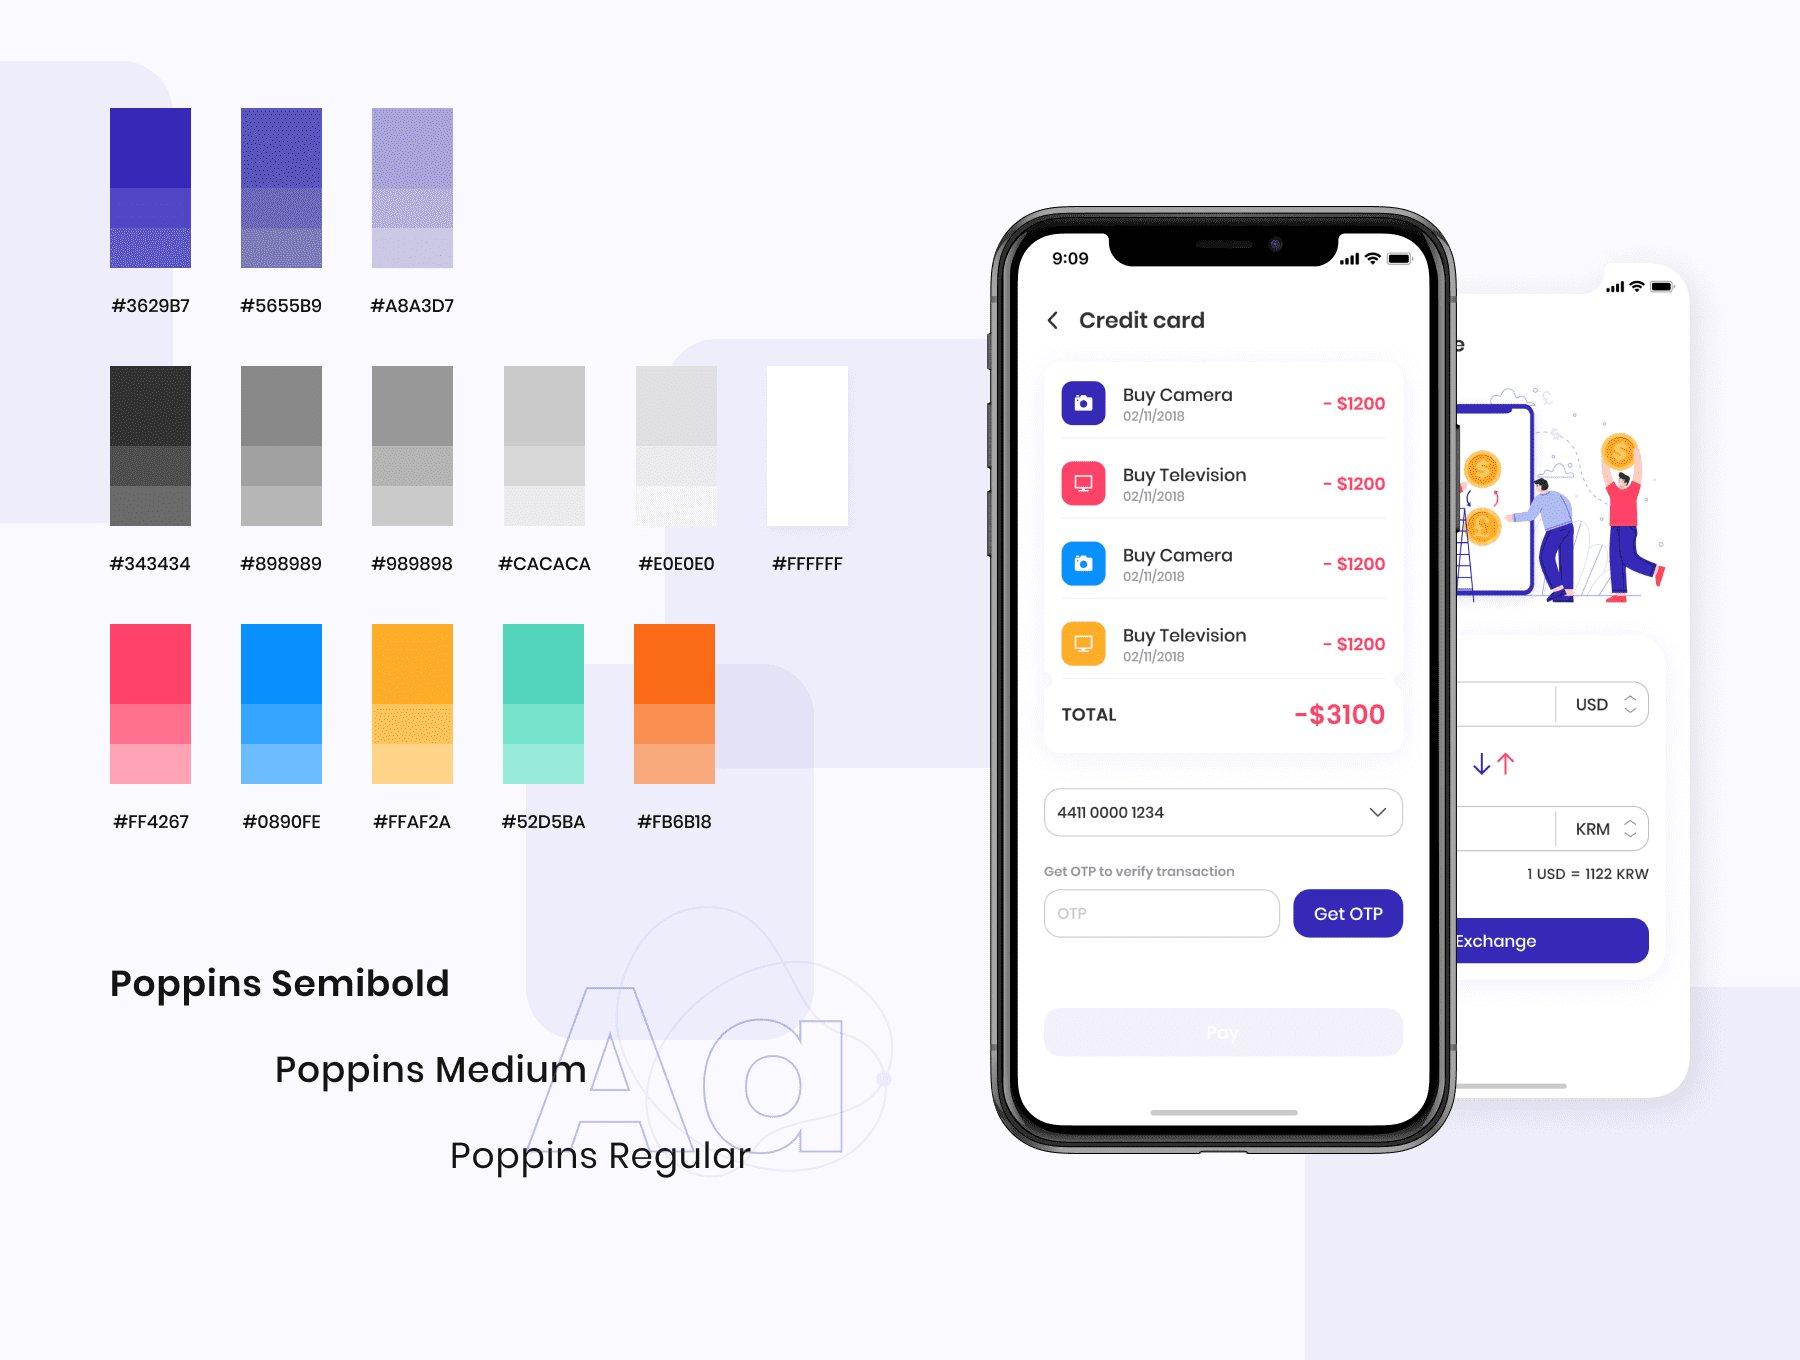 airibank-finance-mobile-app-ui-kit-www.mockuphill.com